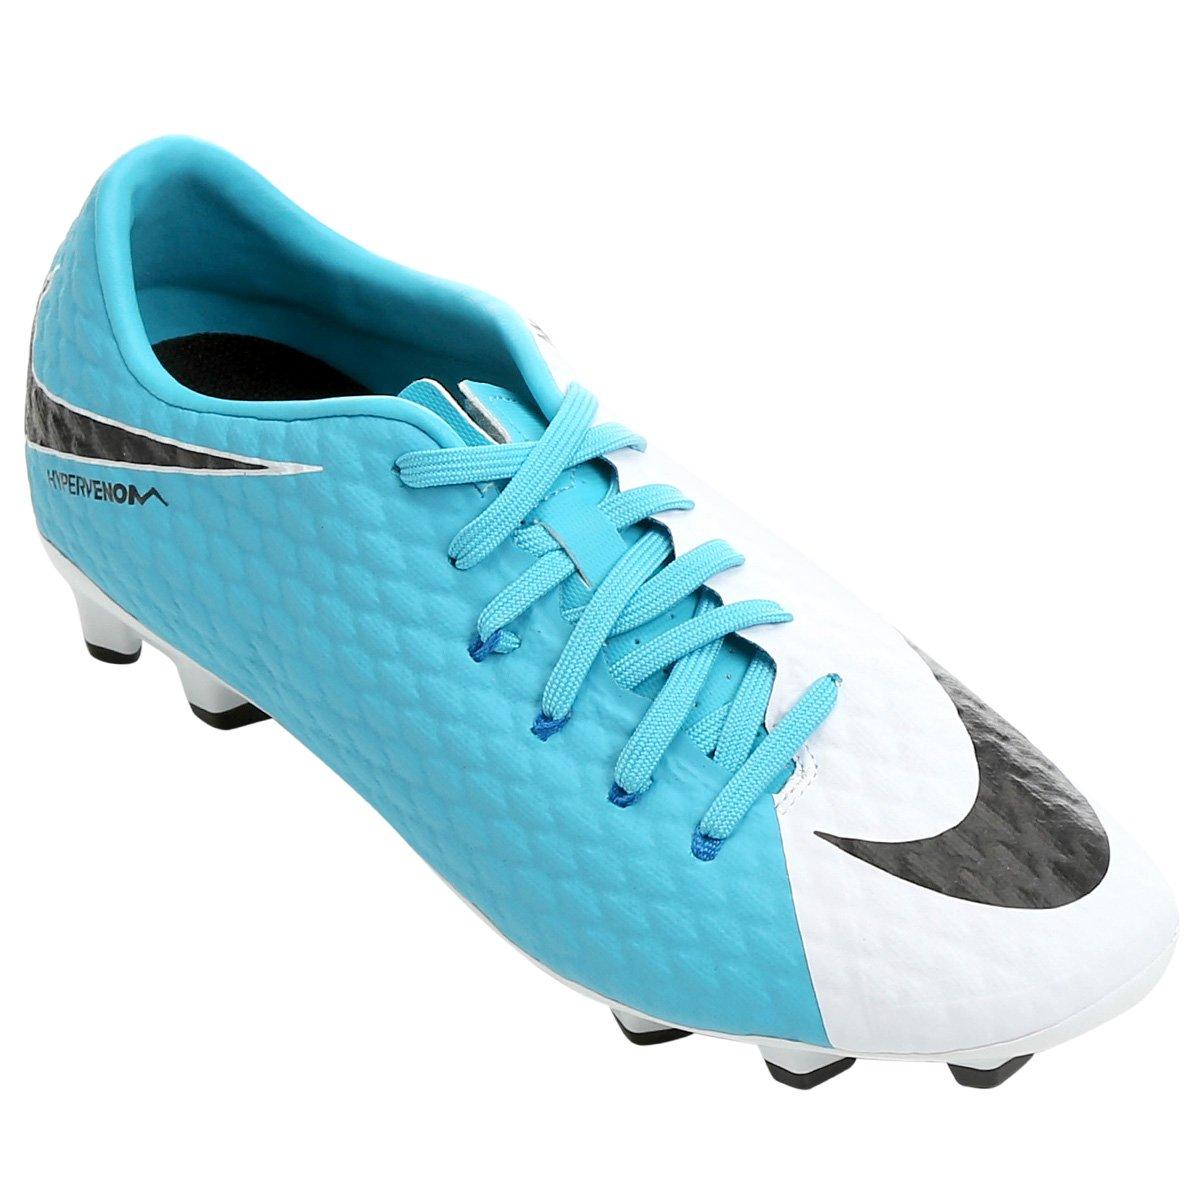 Chuteira Campo Nike Hypervenom Phelon 3 FG - Branco e Azul - Compre ... d0688020a2936